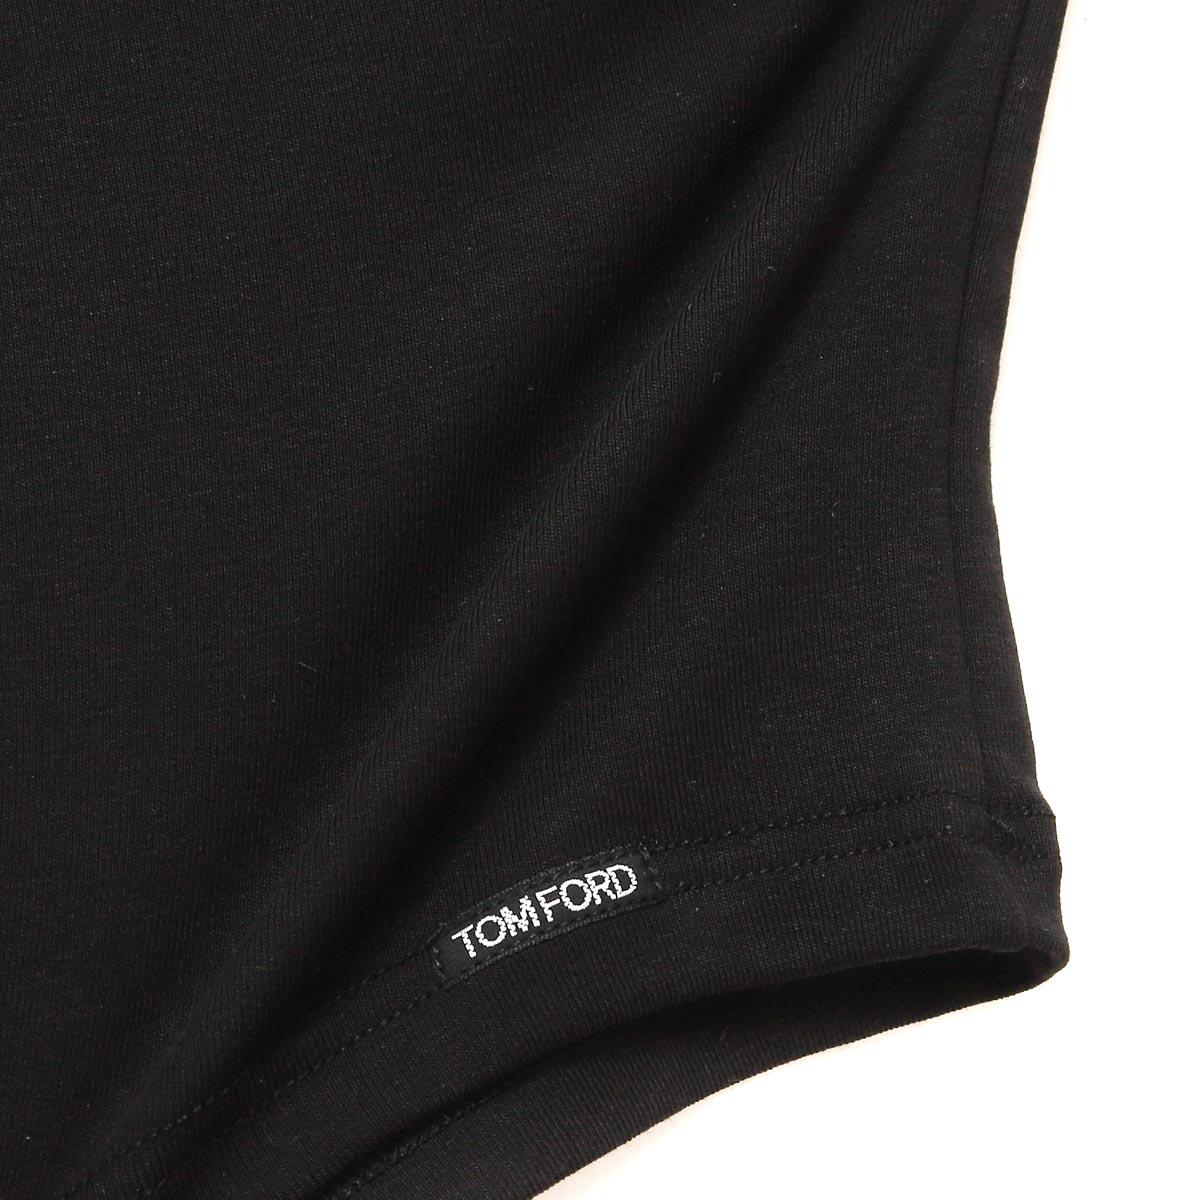 TOM FORD トムフォード Vネック Tシャツ【返品交換不可】 メンズ